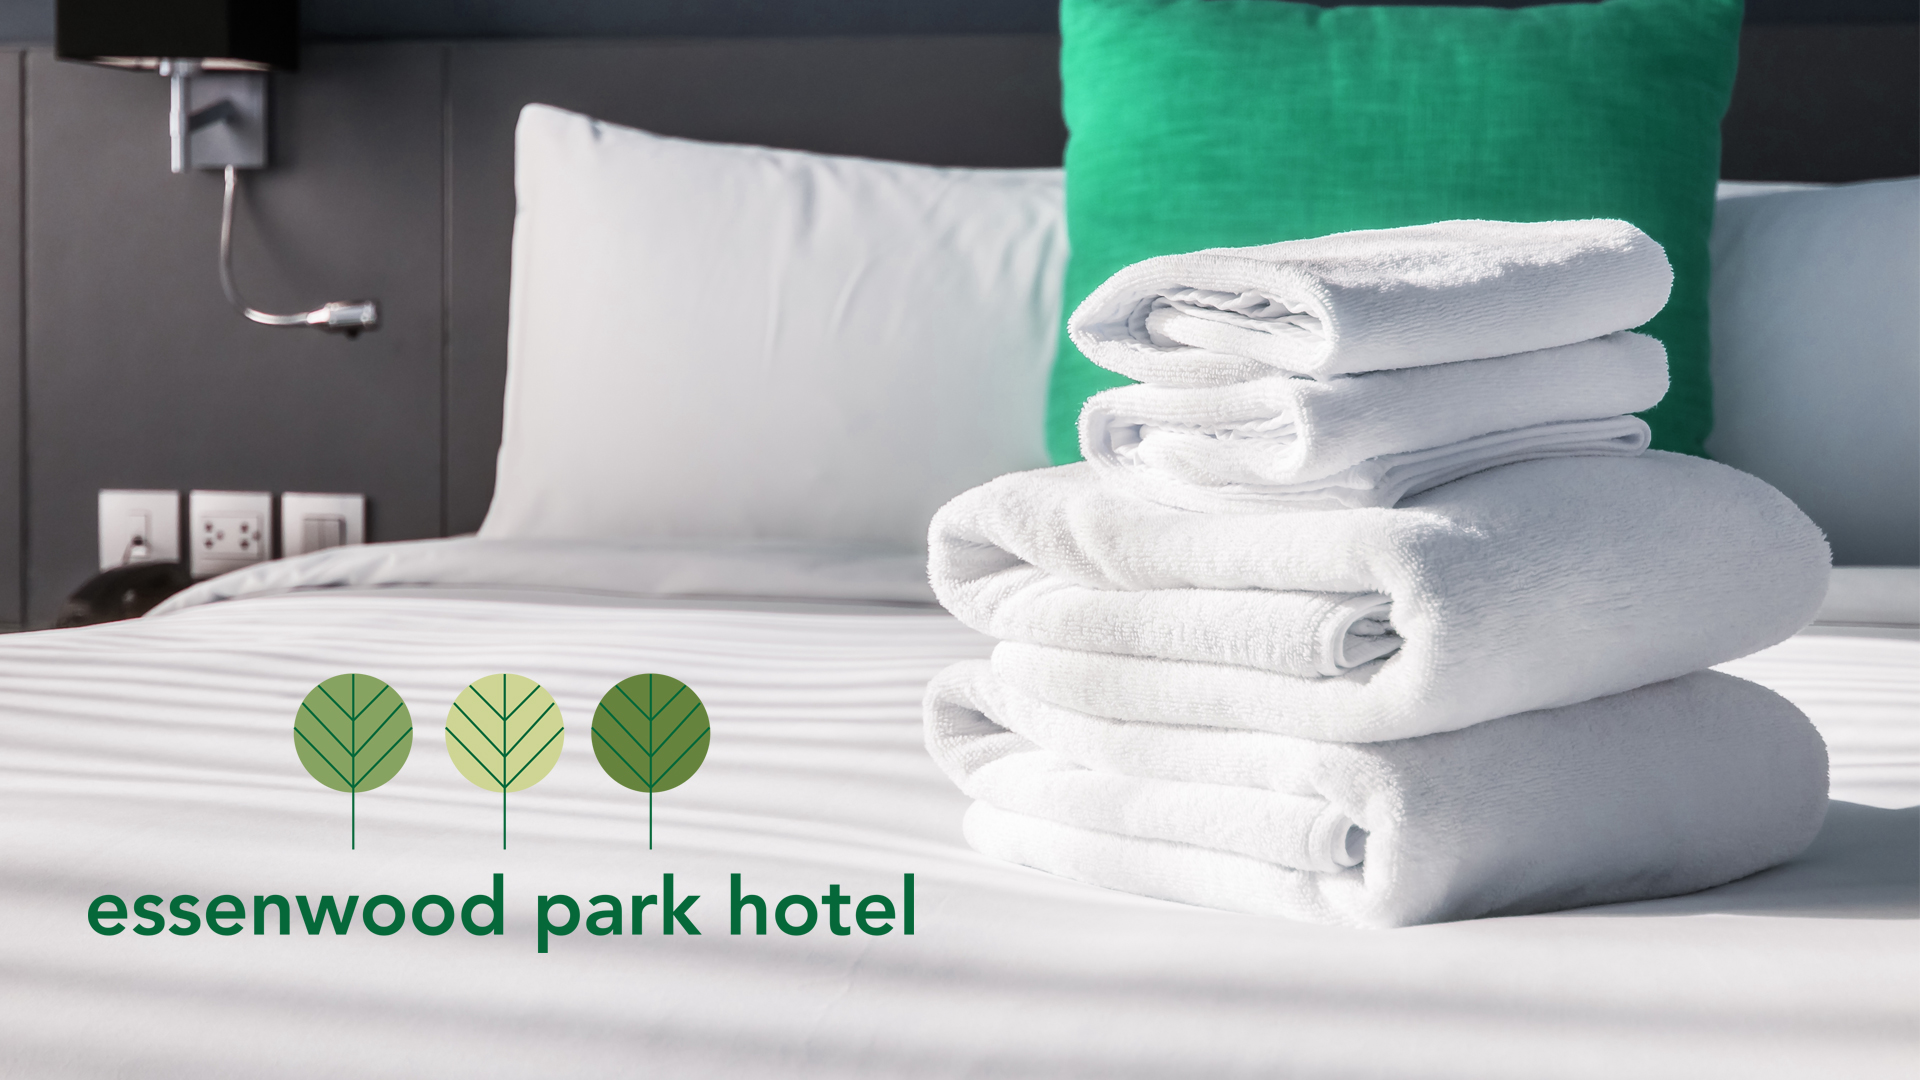 Essenwood Park Hotel